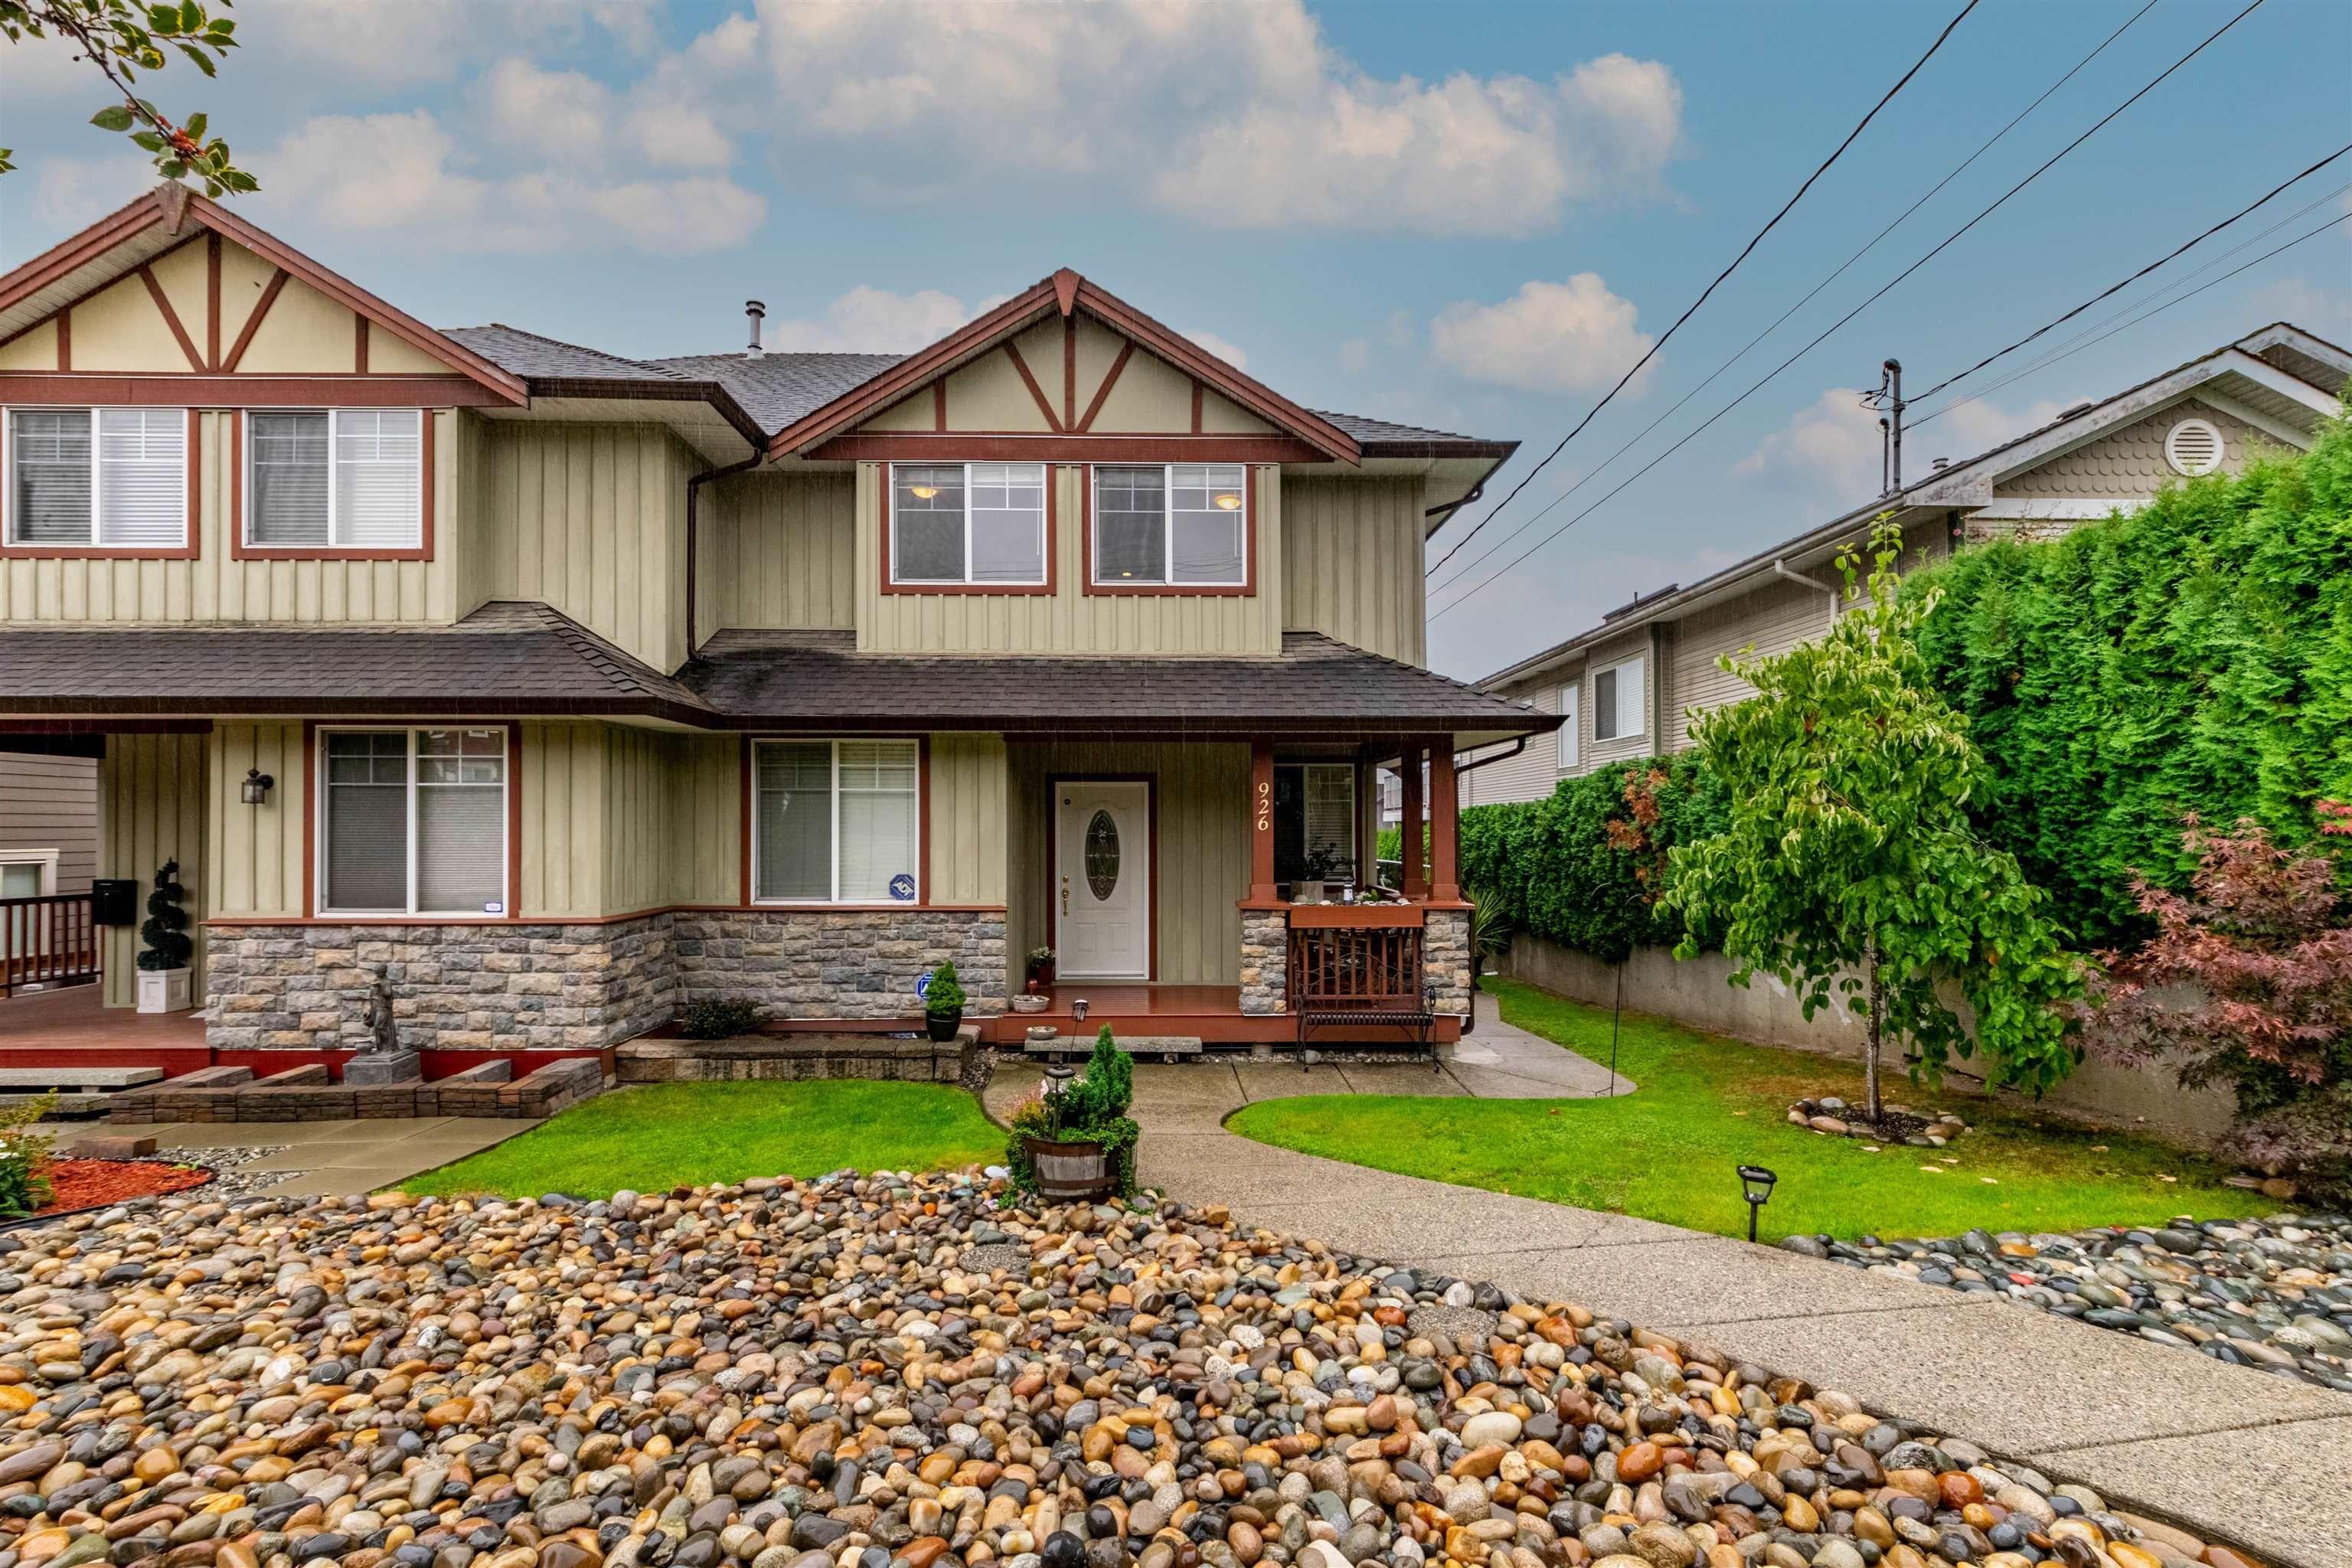 Main Photo: 926 HARRIS Avenue in Coquitlam: Maillardville 1/2 Duplex for sale : MLS®# R2618051